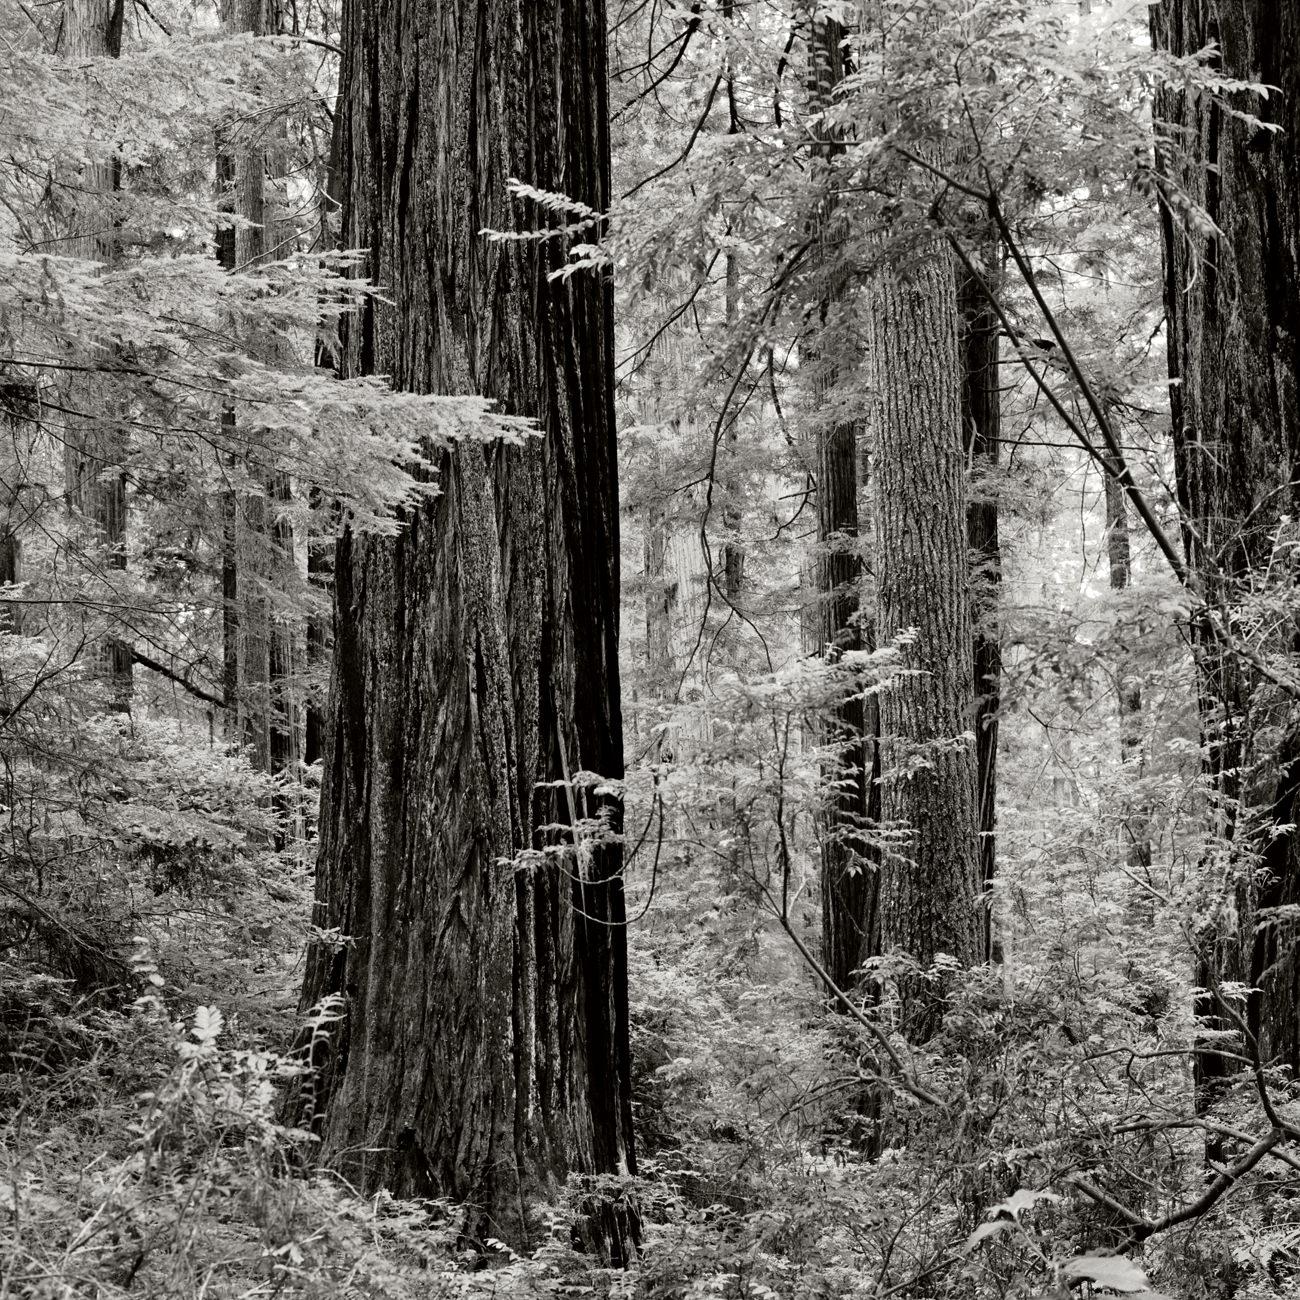 JS_Redwood_005.jpg